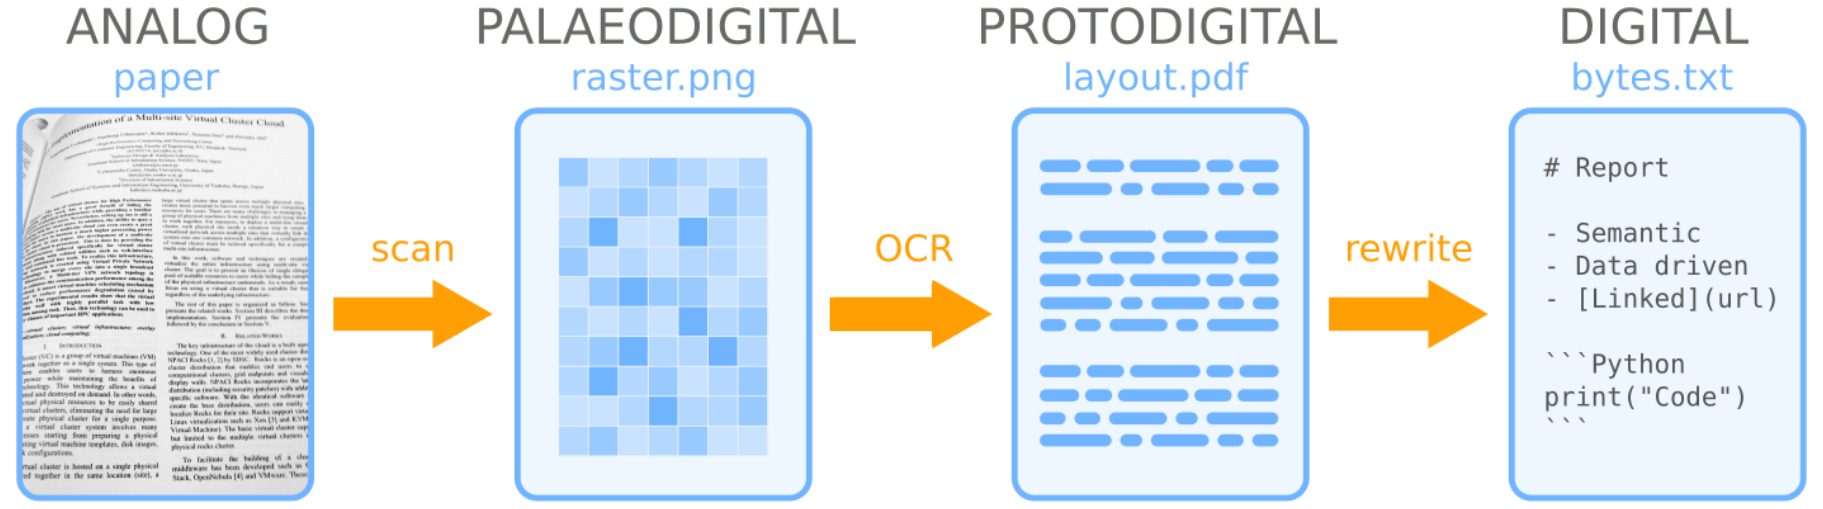 pseudodigital_document.png